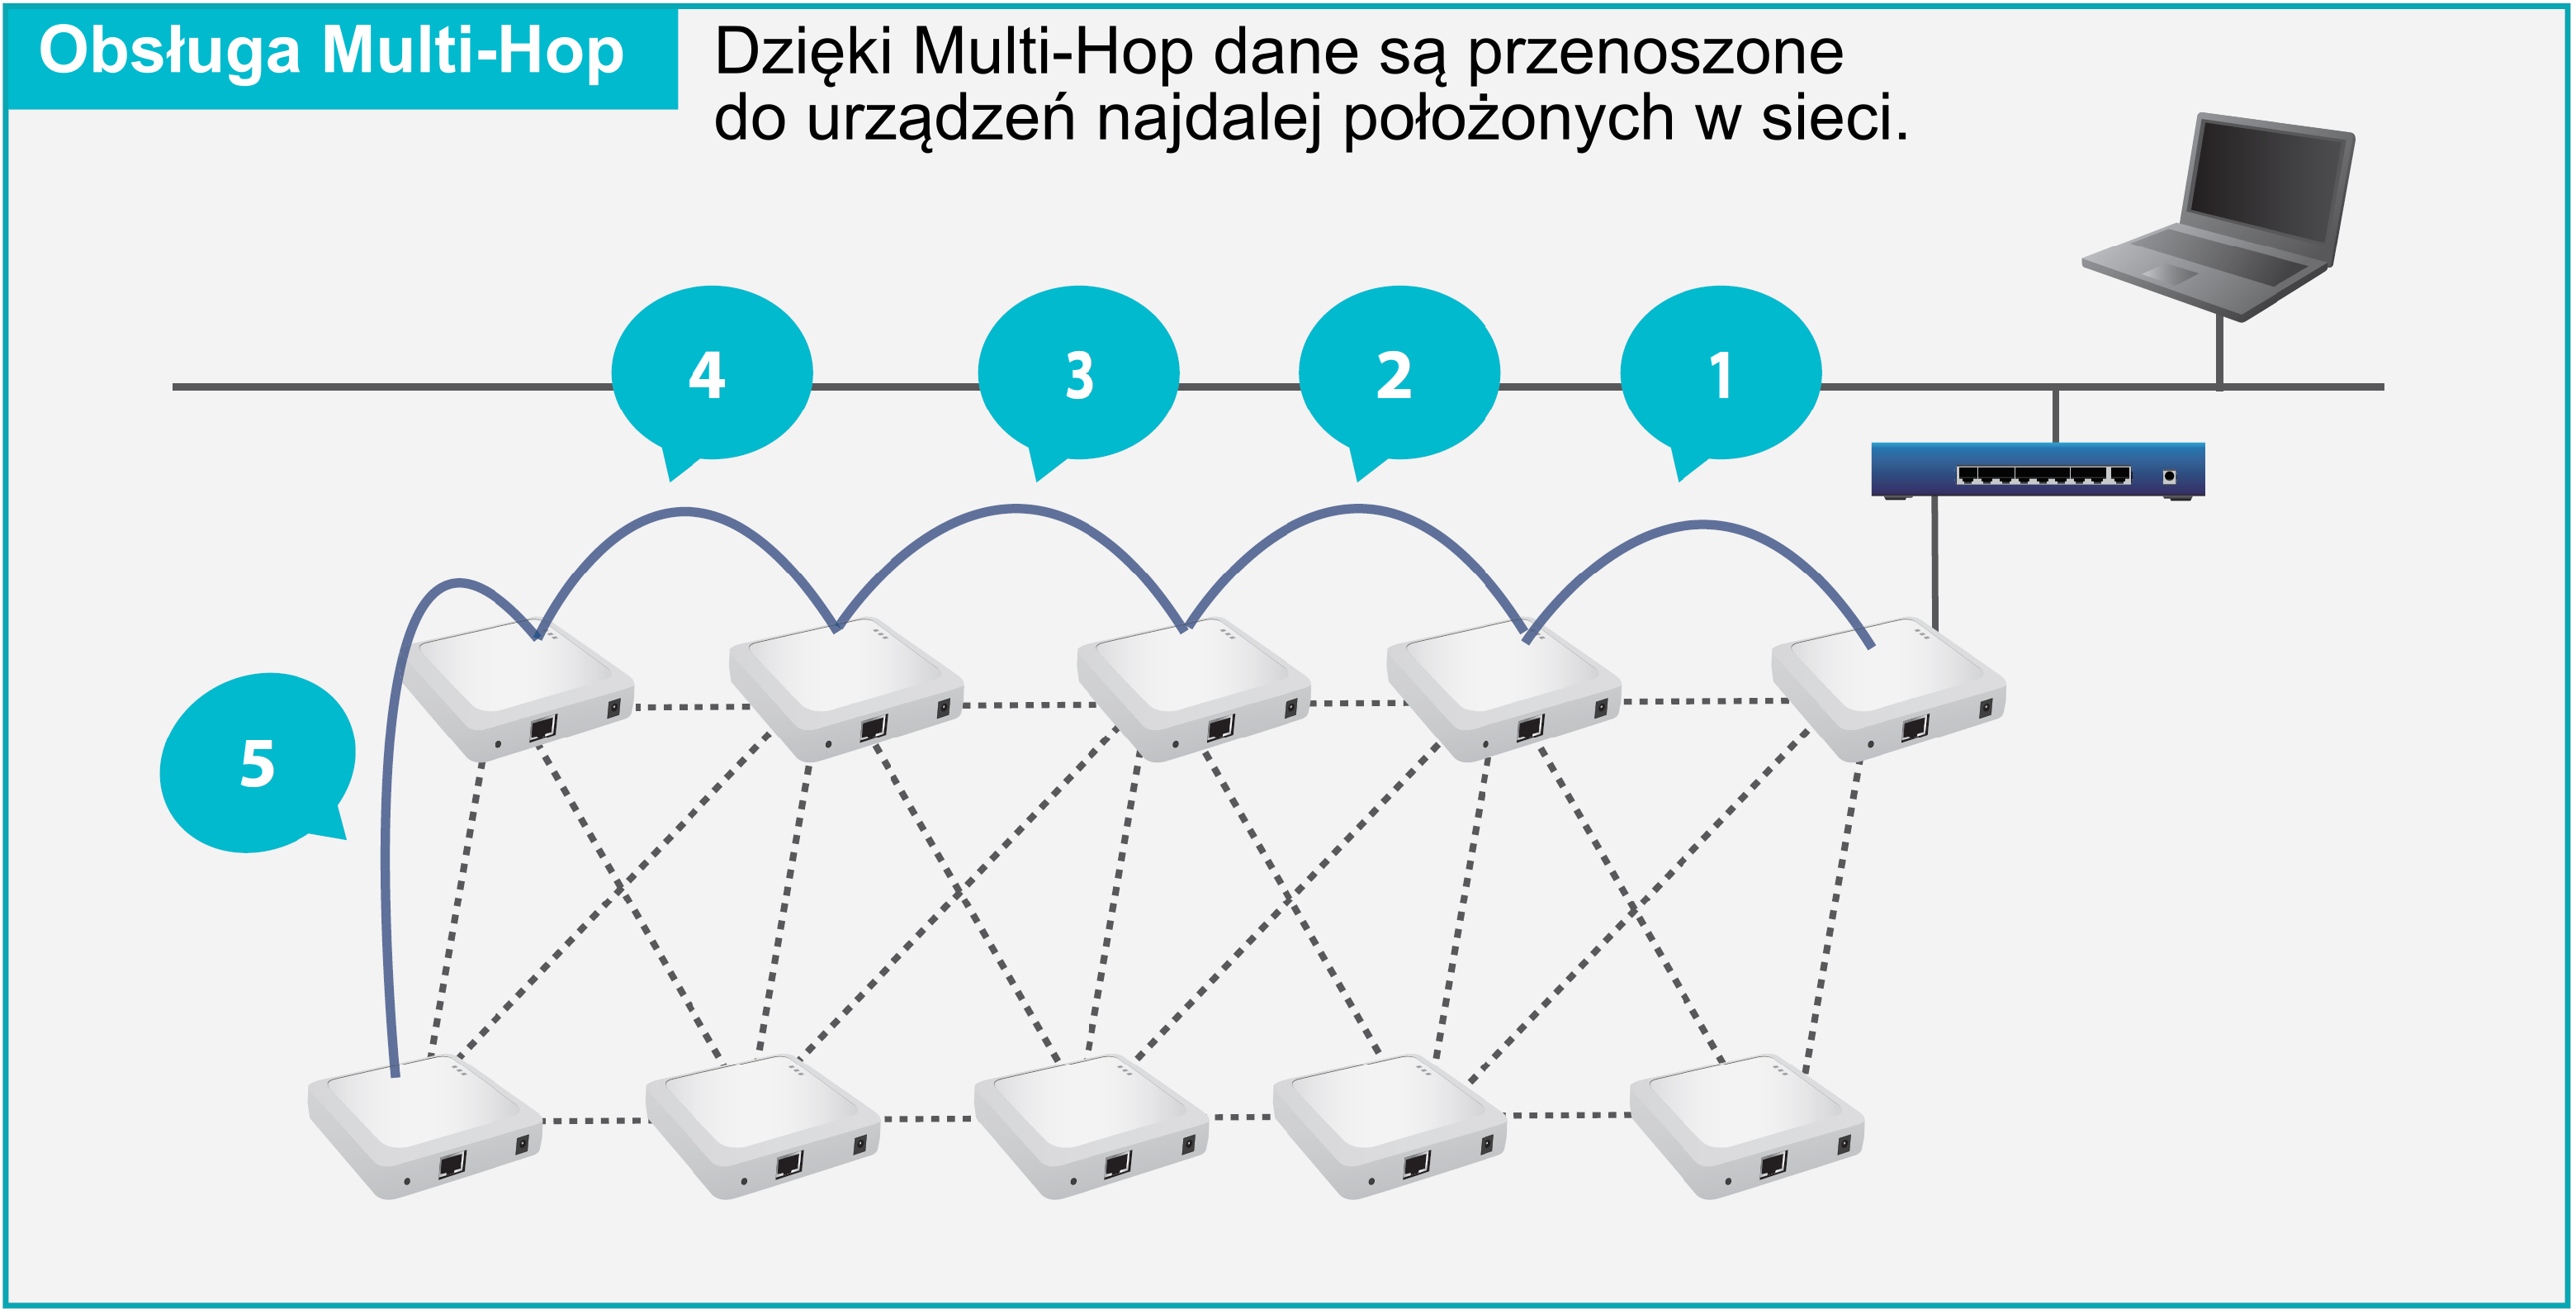 Obsługa Multi-hop